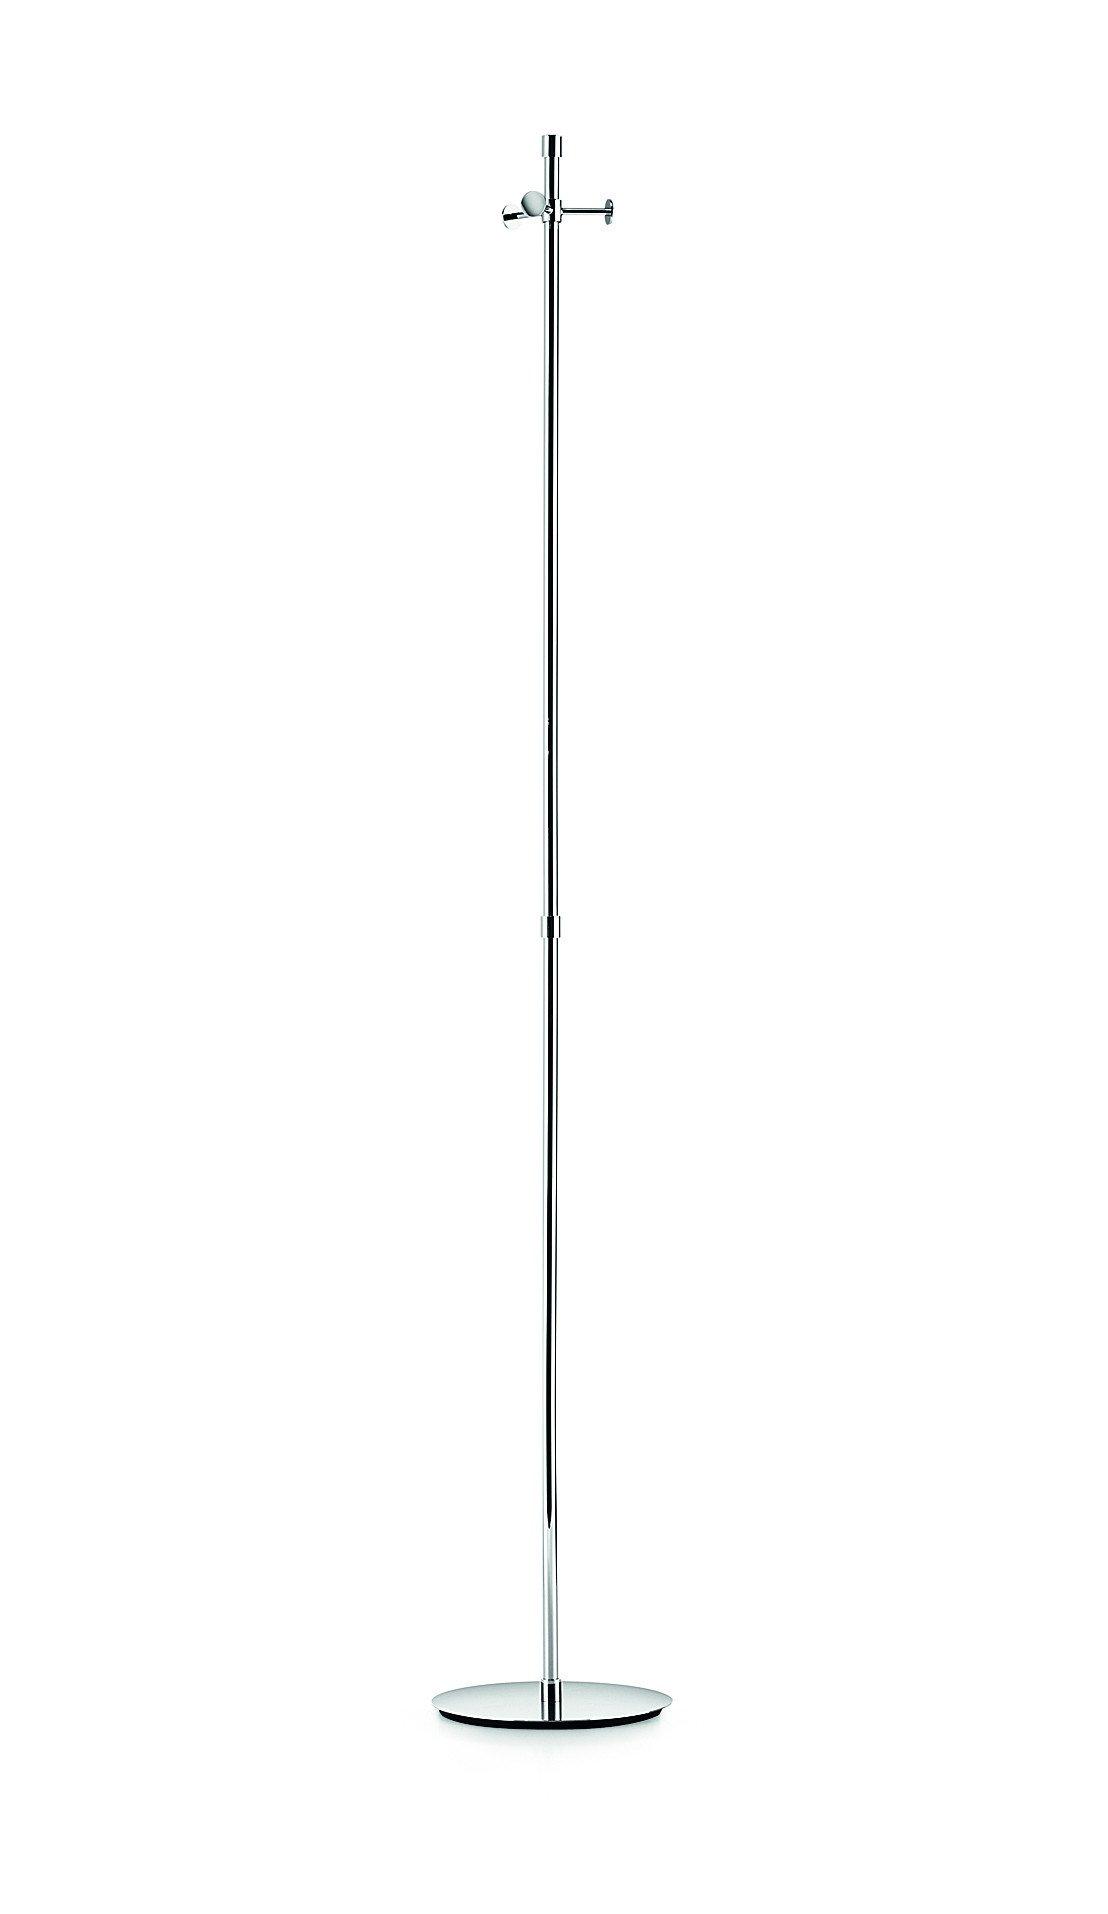 LB Brass Metal Coat Rack Stand Tree Hanger Holder W/ 3 Hooks Polished Chrome